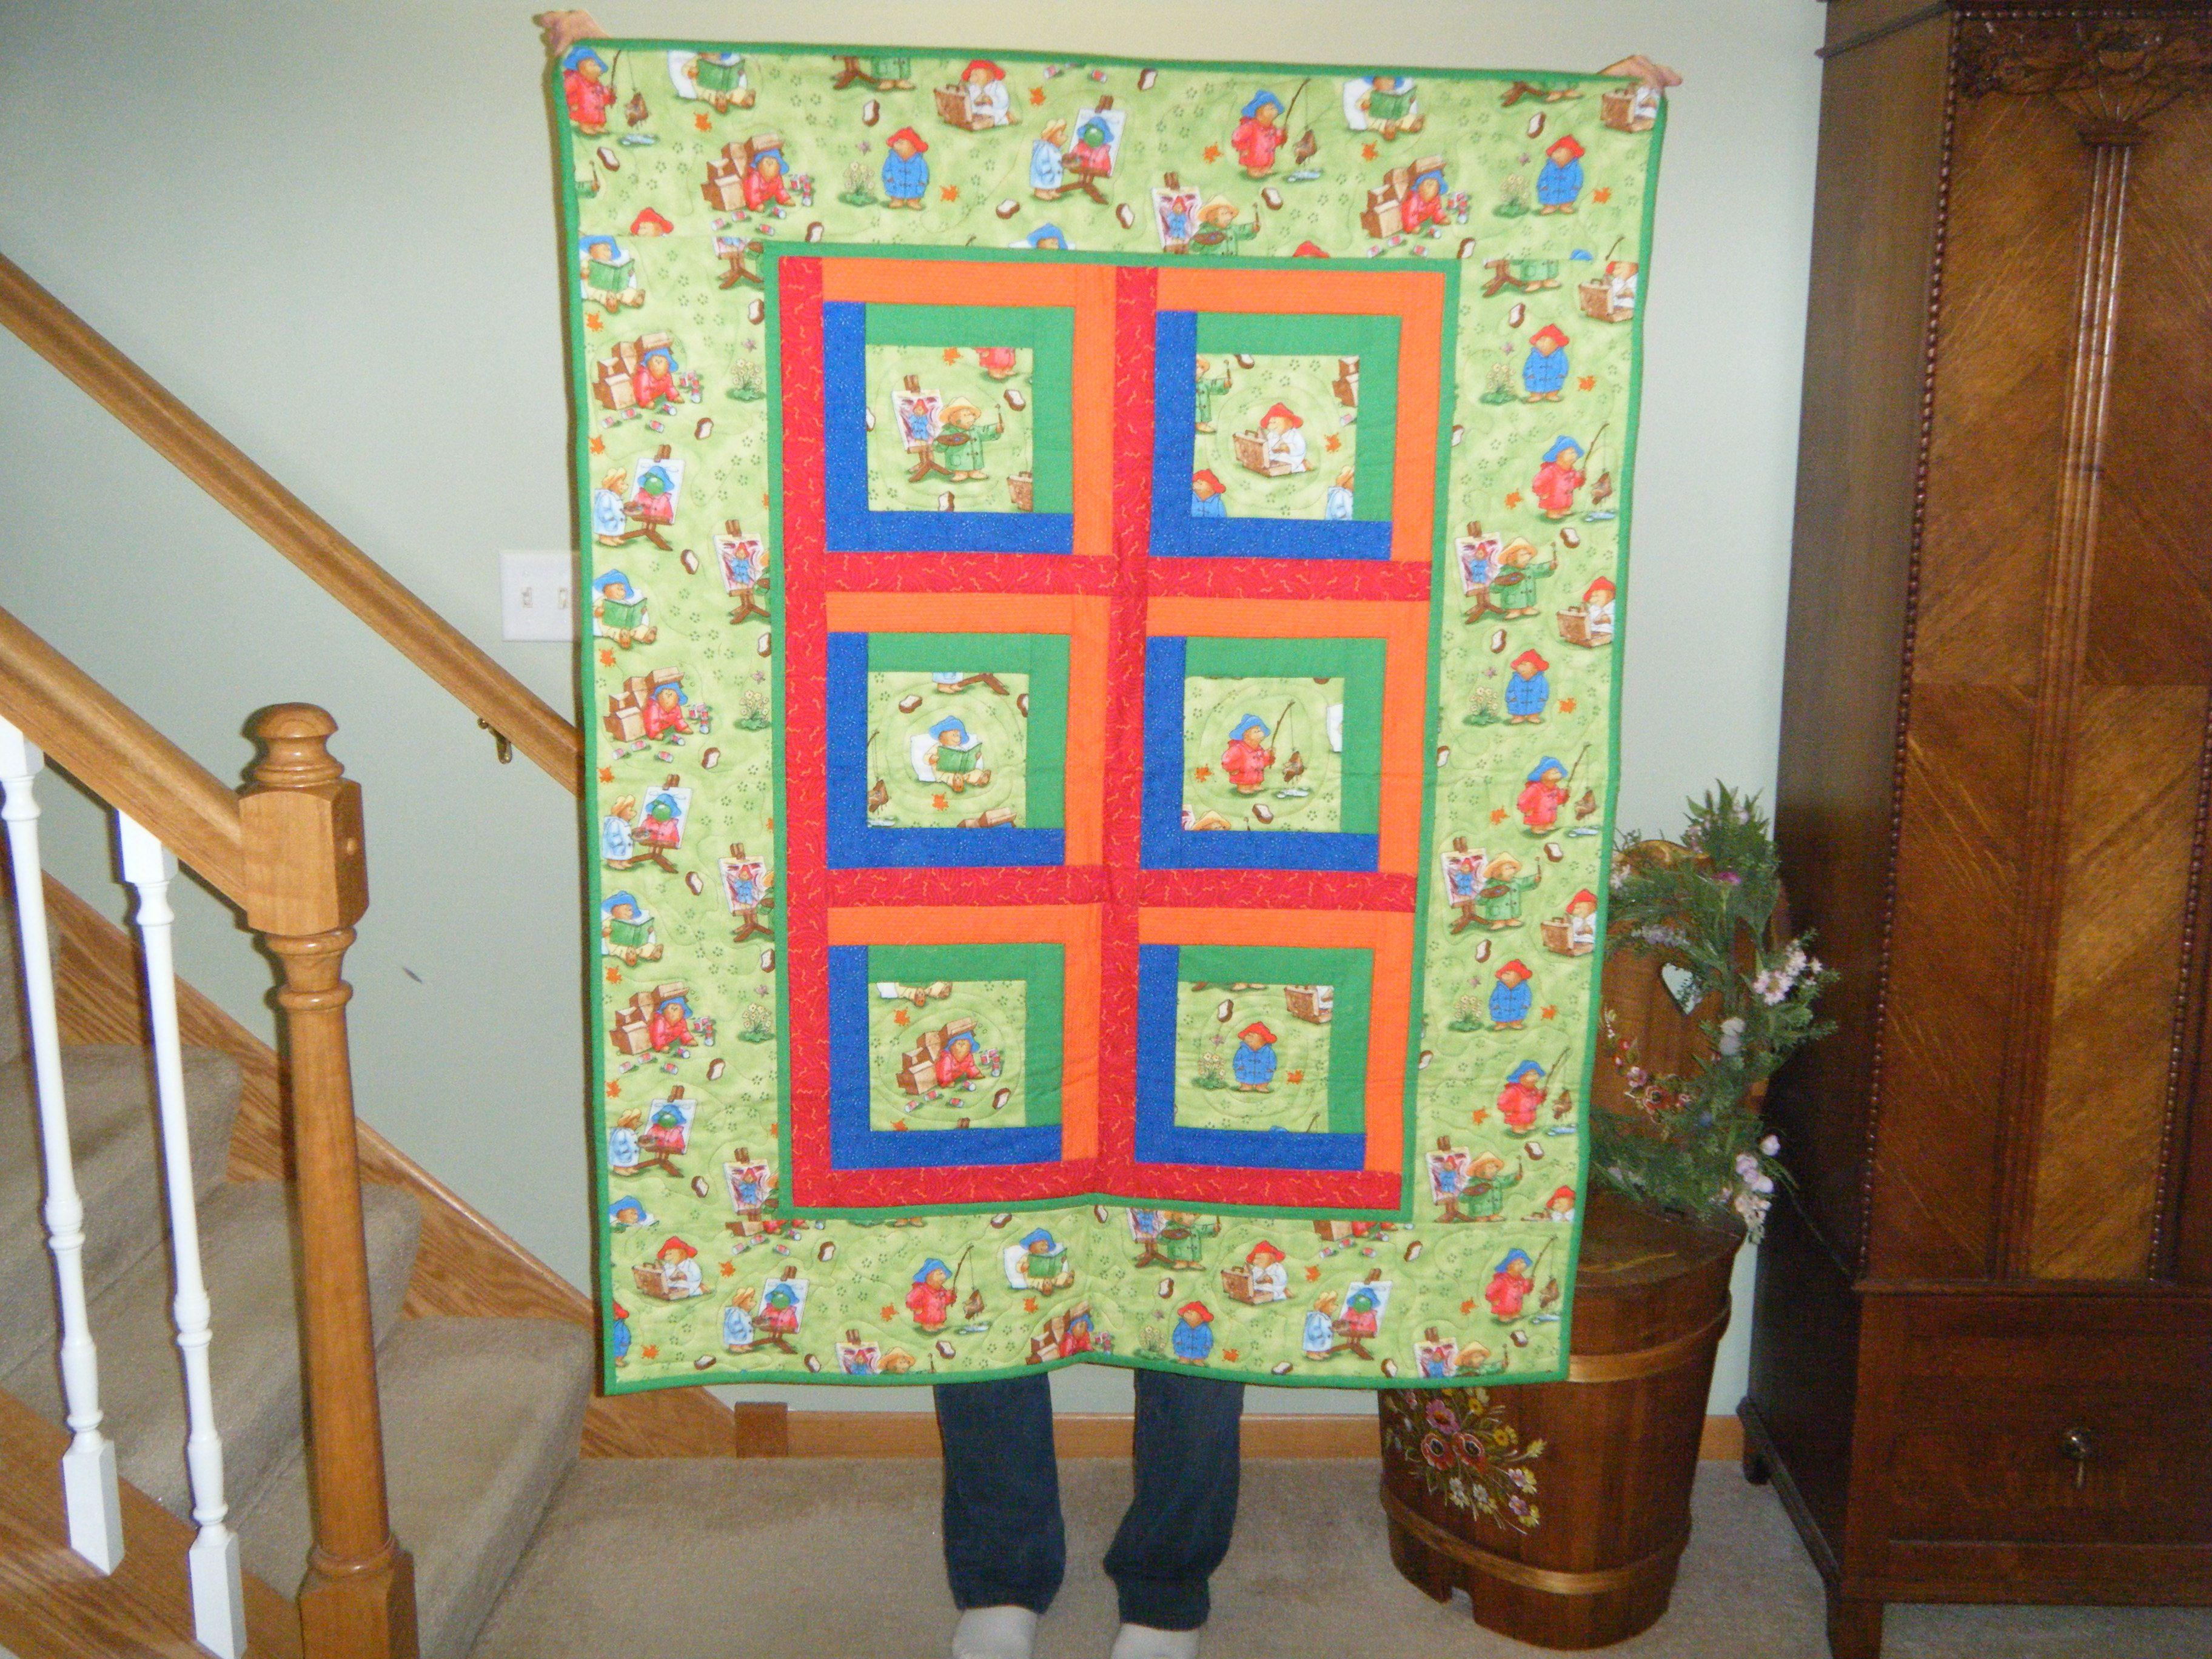 Paddington Bear quilt. | Quilts | Pinterest | Paddington bear and ... : paddington bear quilt - Adamdwight.com